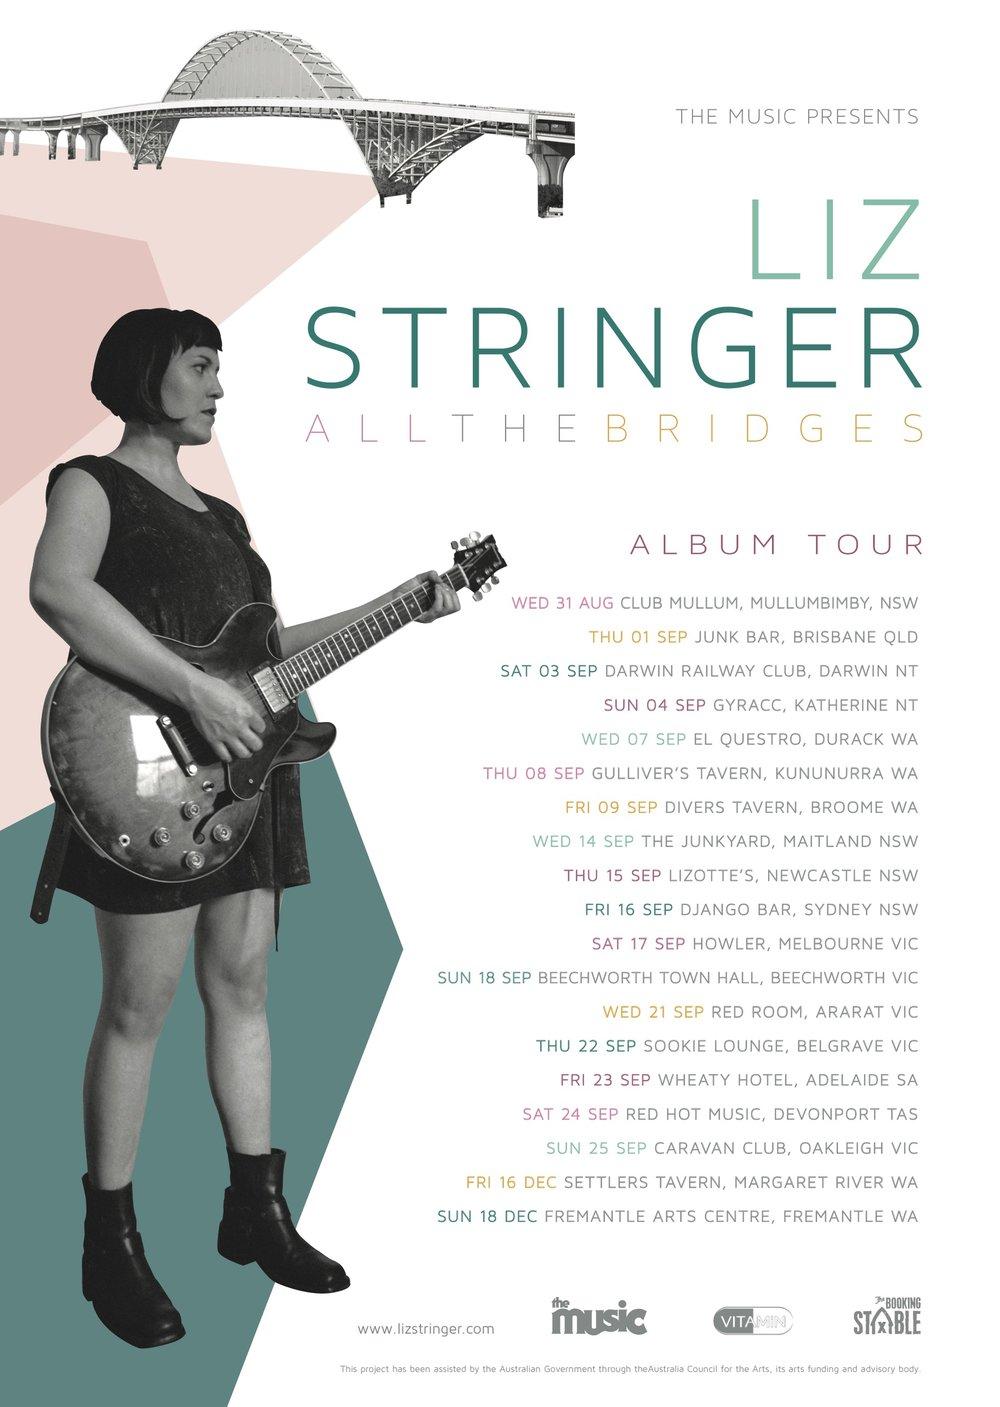 LS_Tour Poster_AUS_Web.jpg